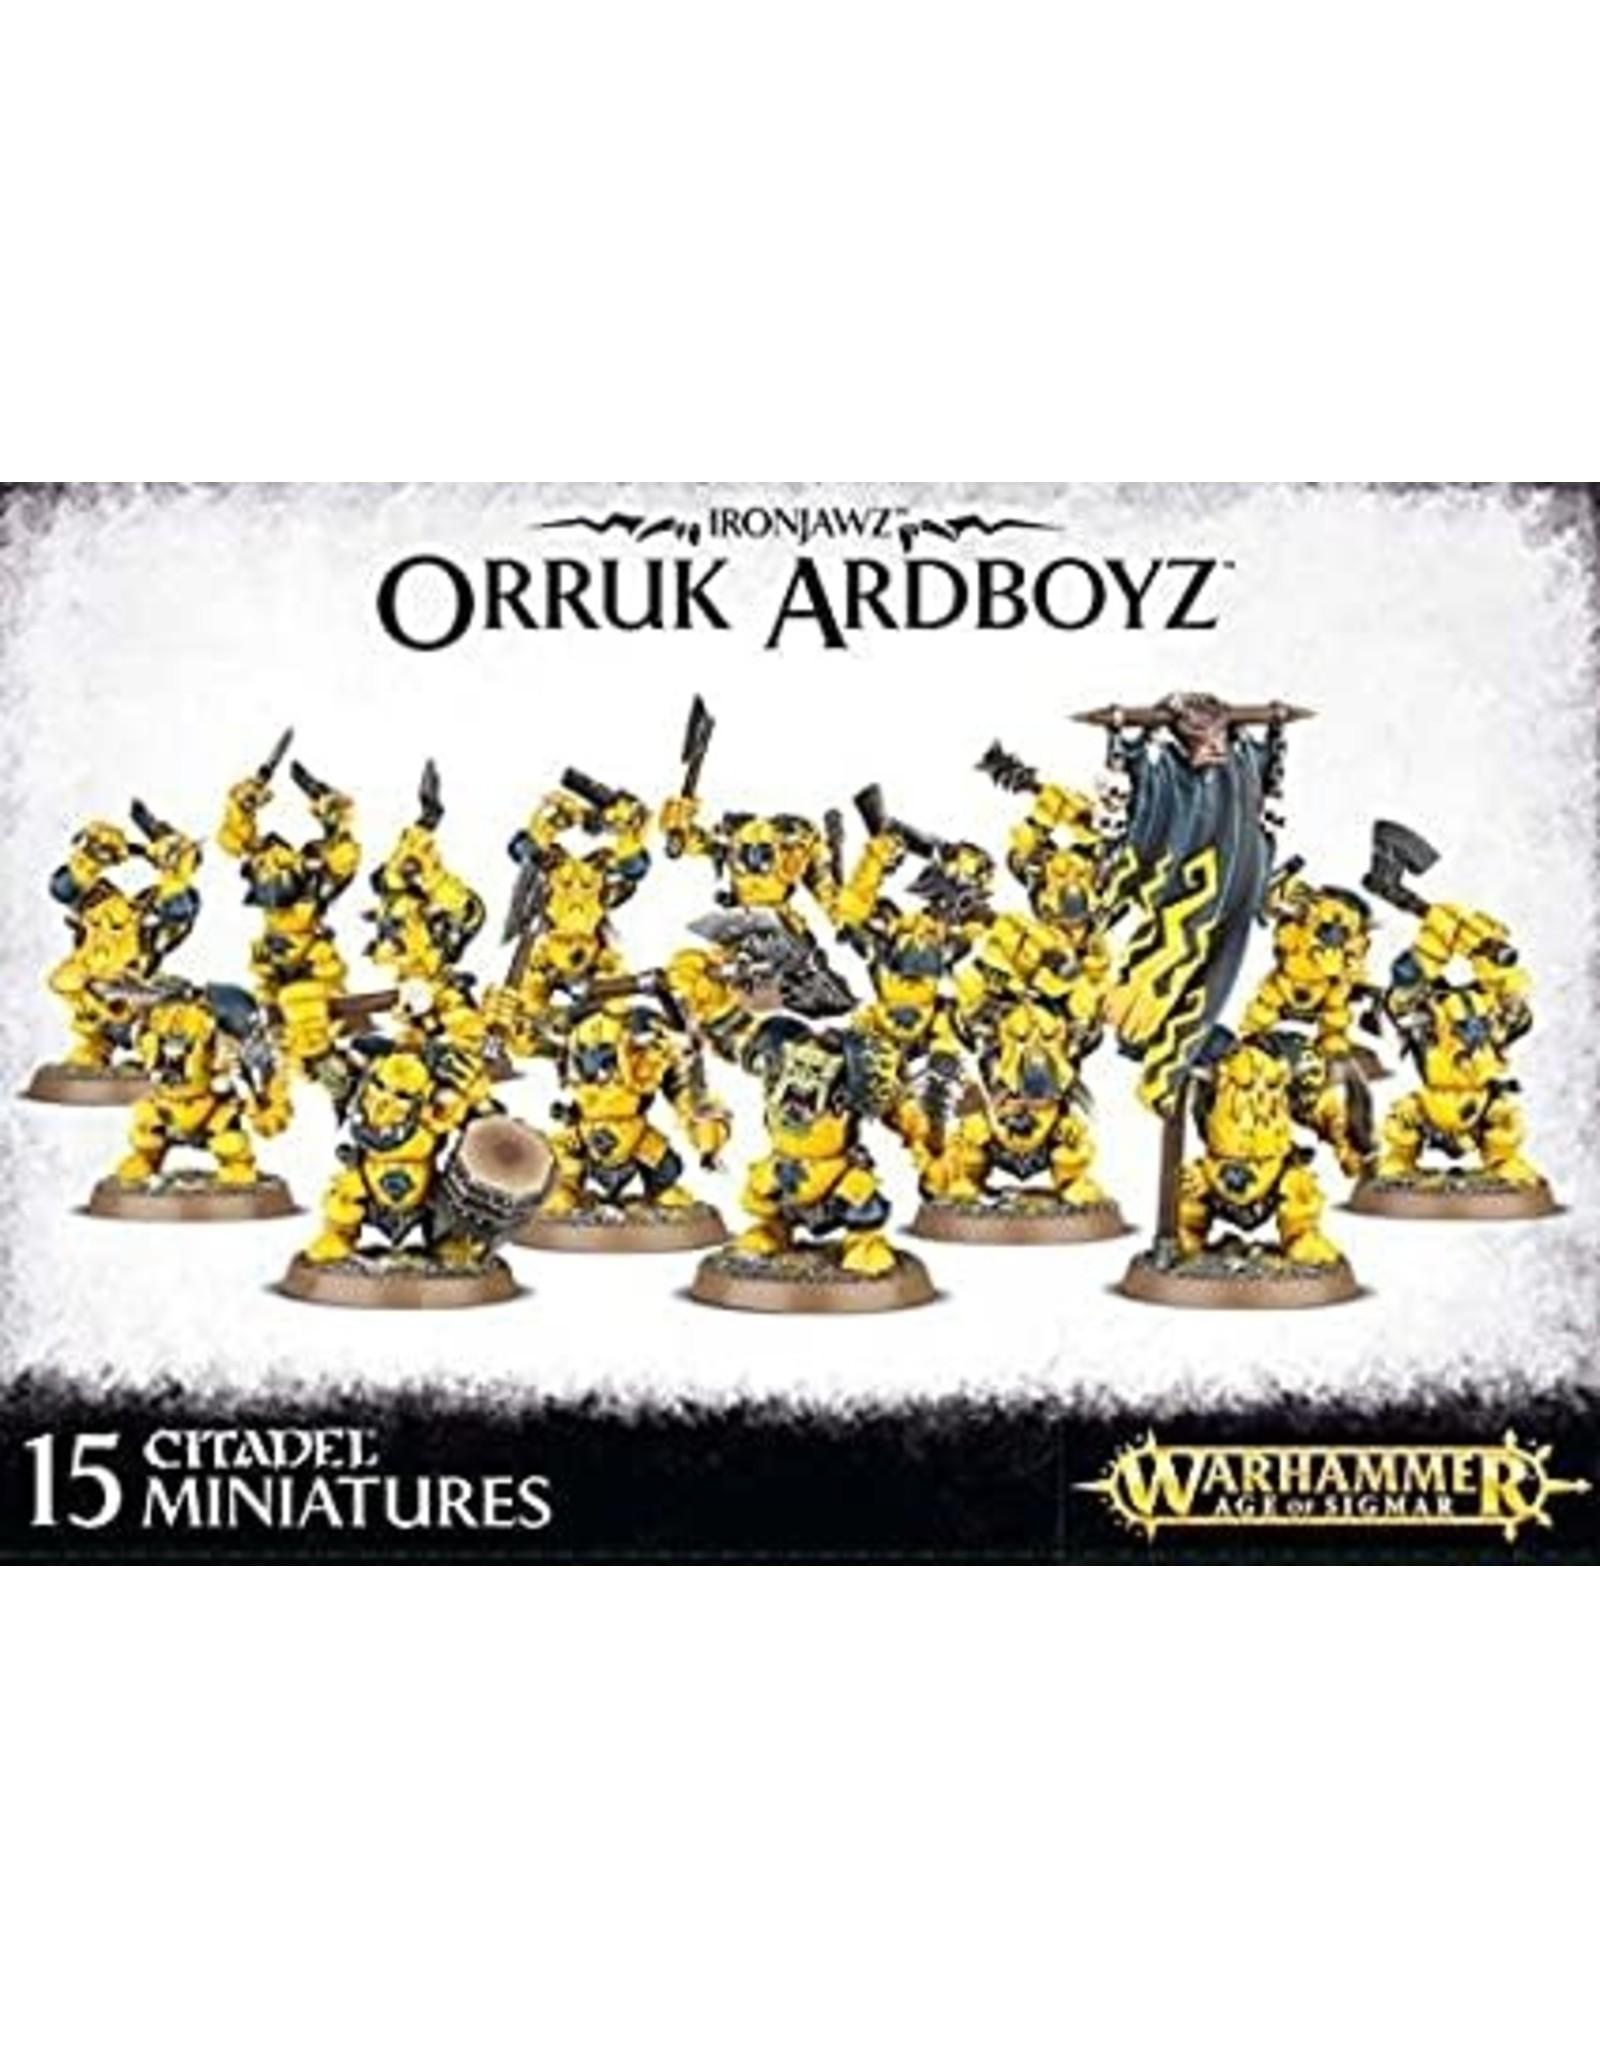 Ironjawz Orruk ArdBoyz (AOS)